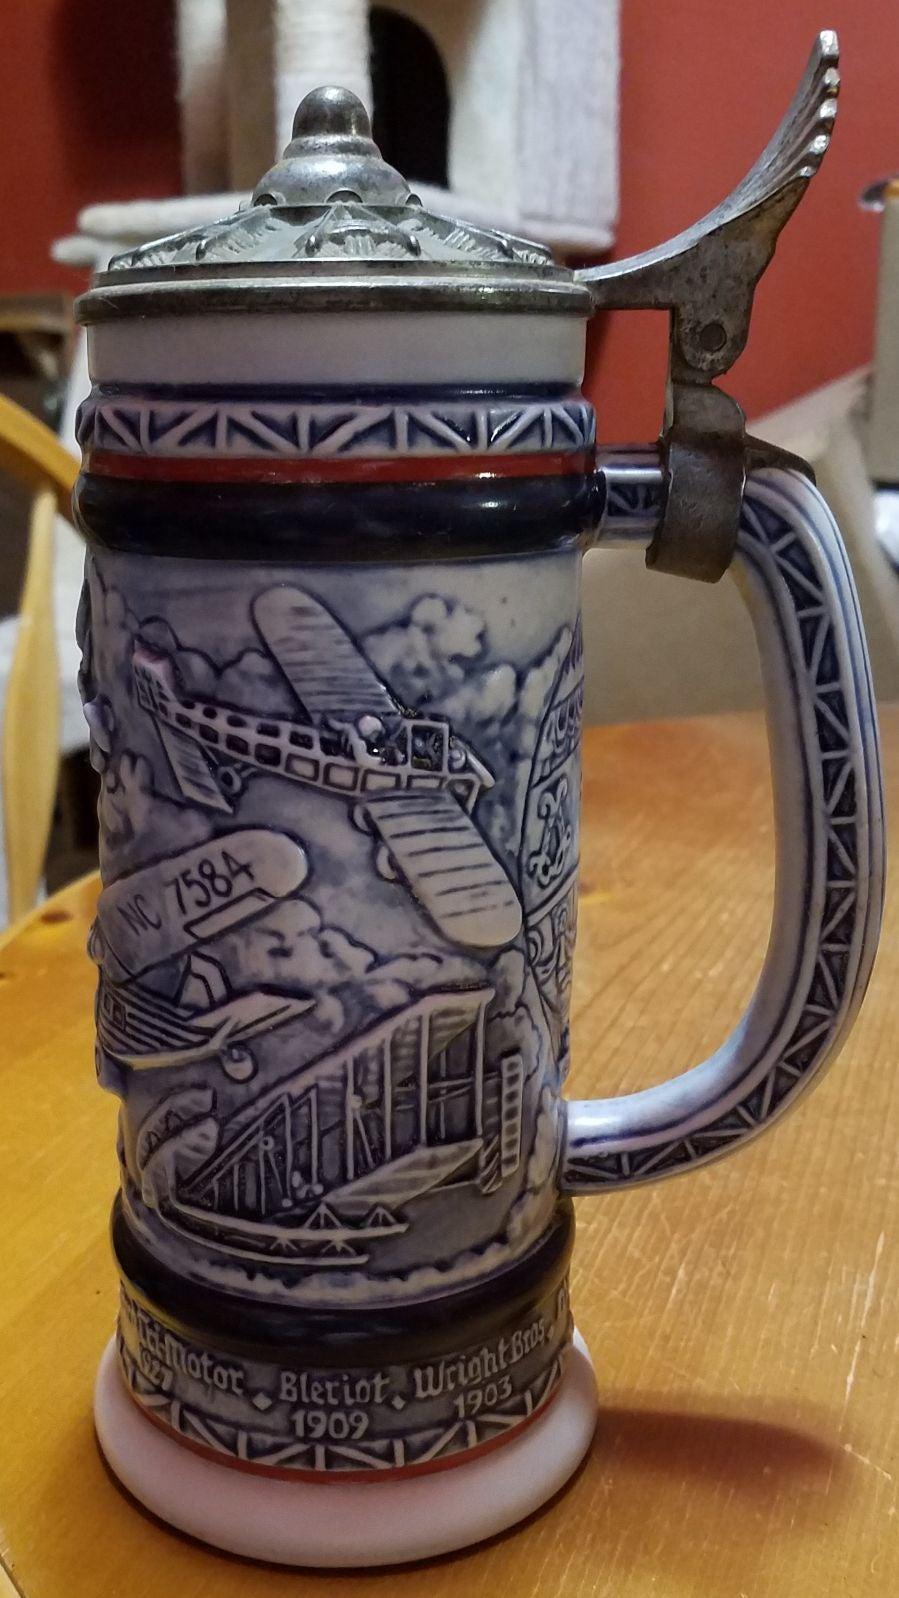 1981 Avon Lidded Collectible Beer Stein